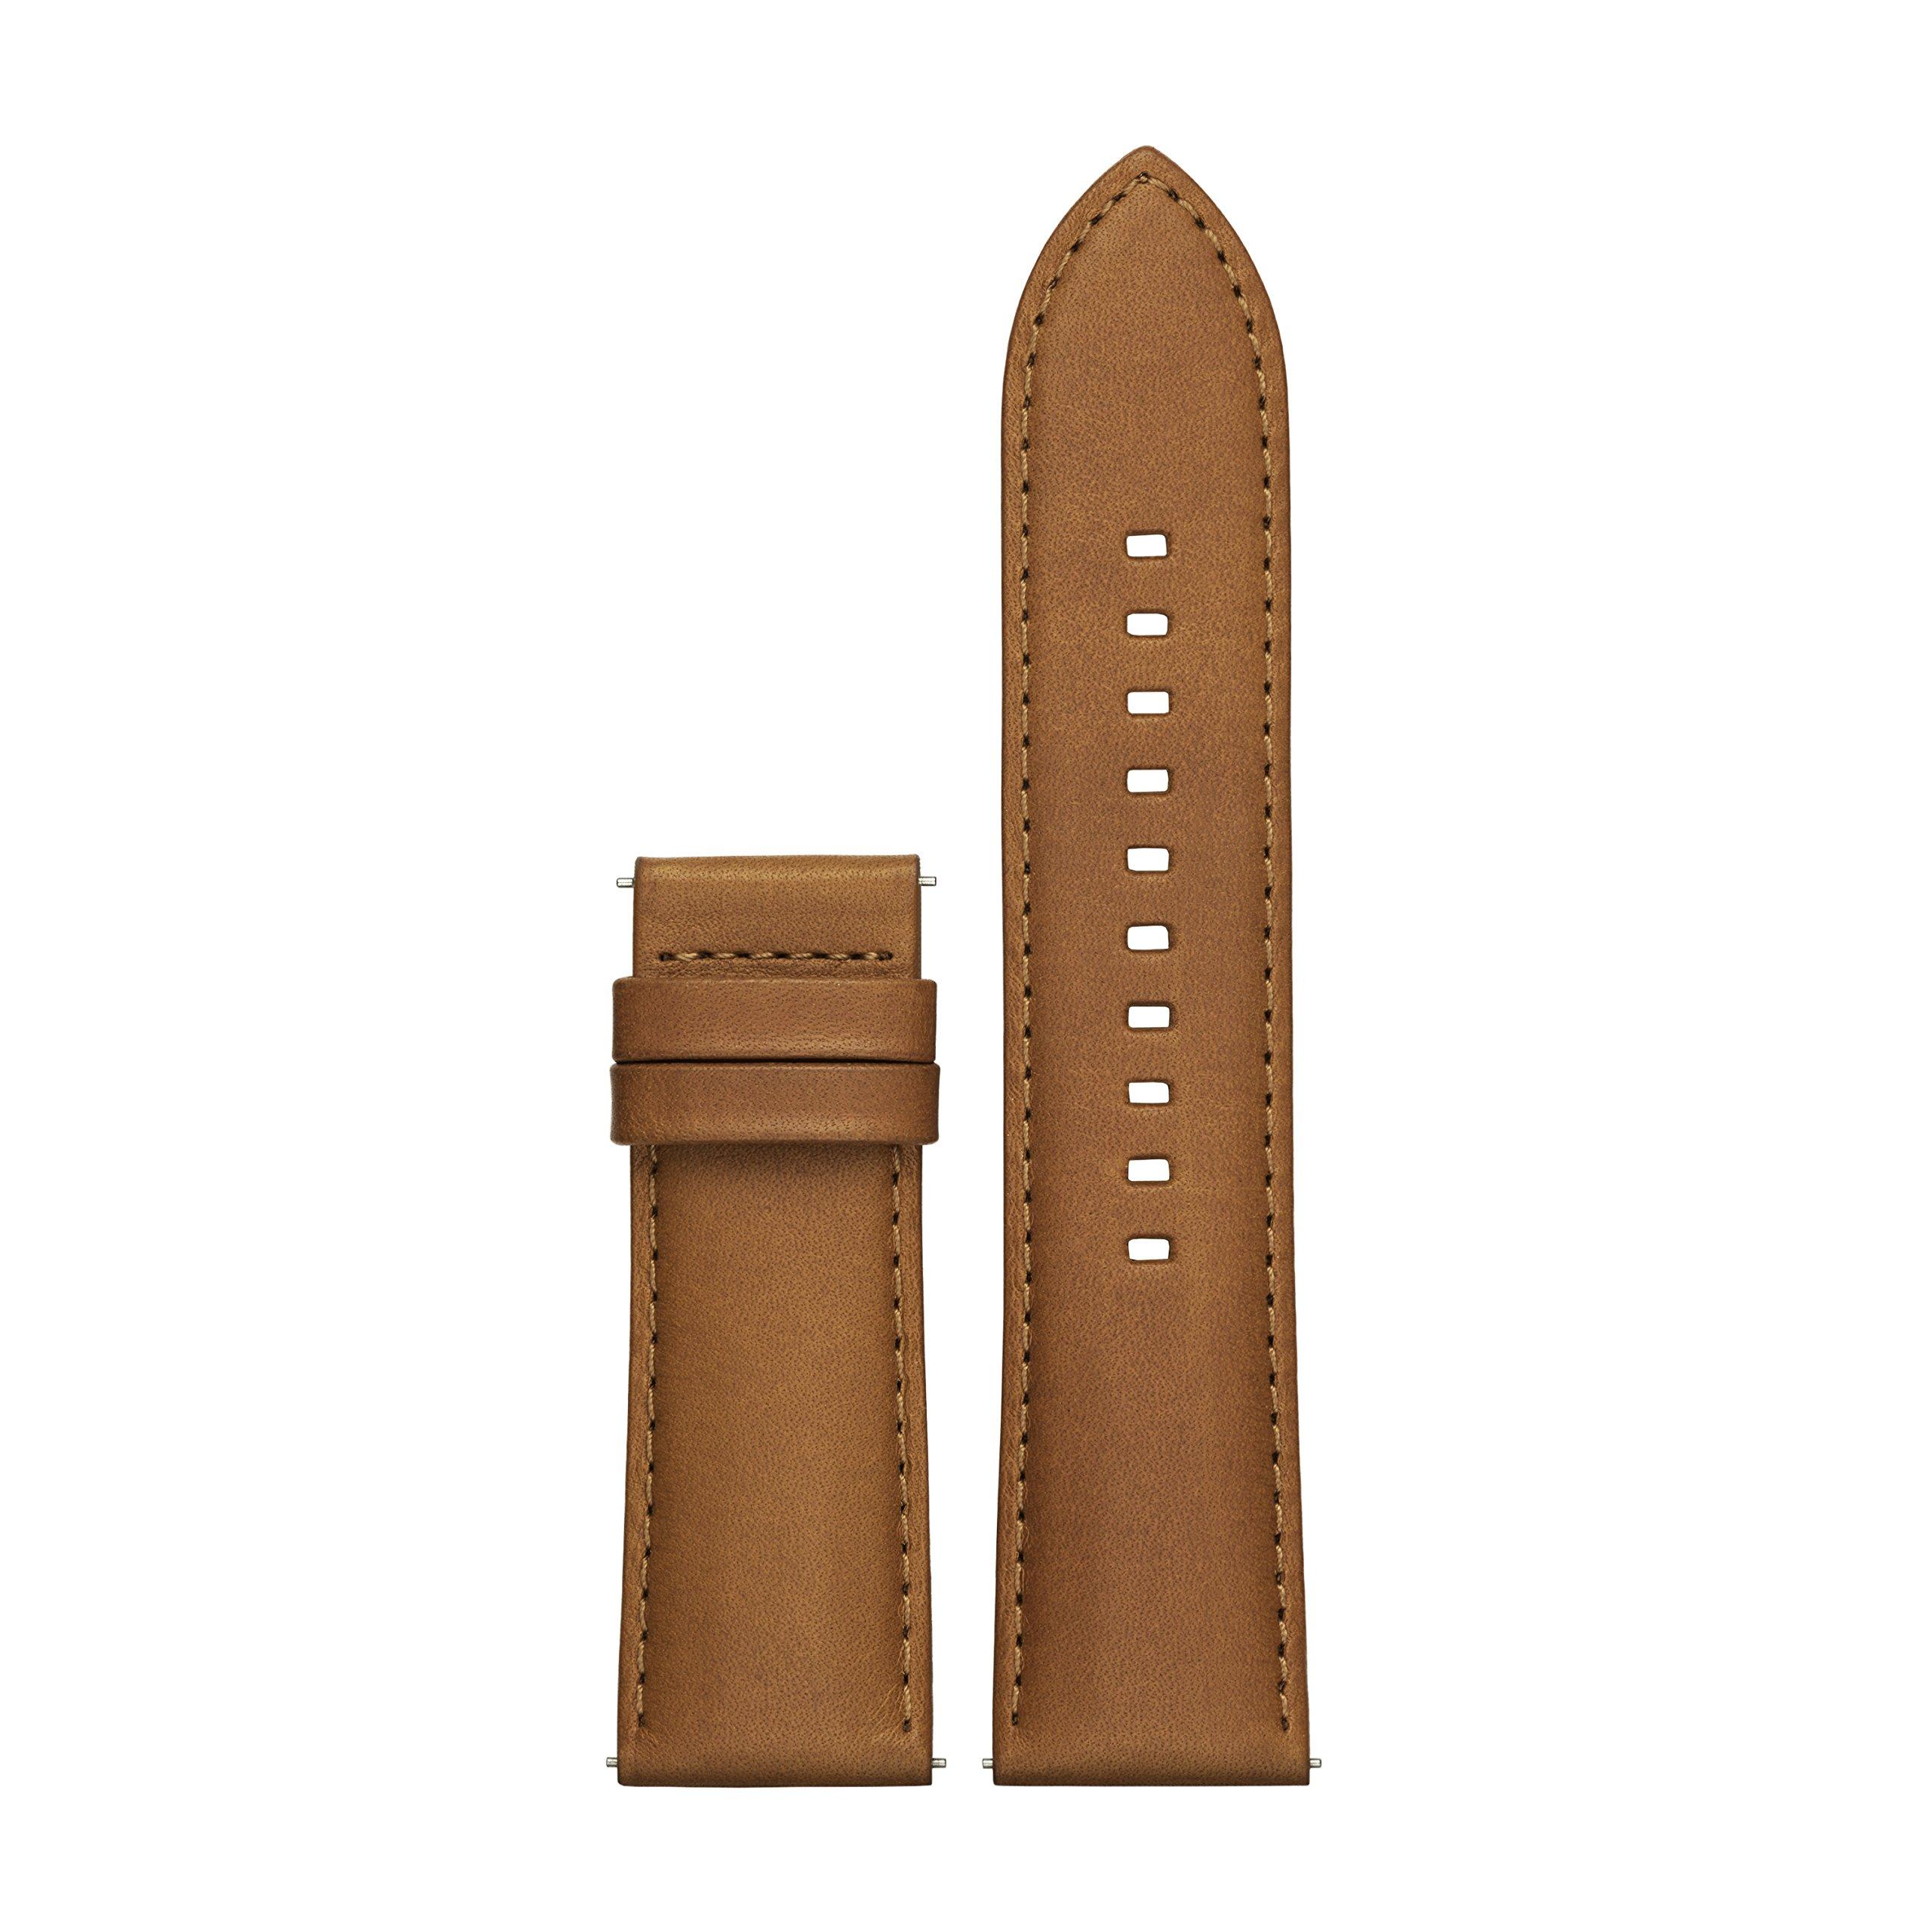 Michael Kors Access Smartwatch Grayson Leather Strap by Michael Kors